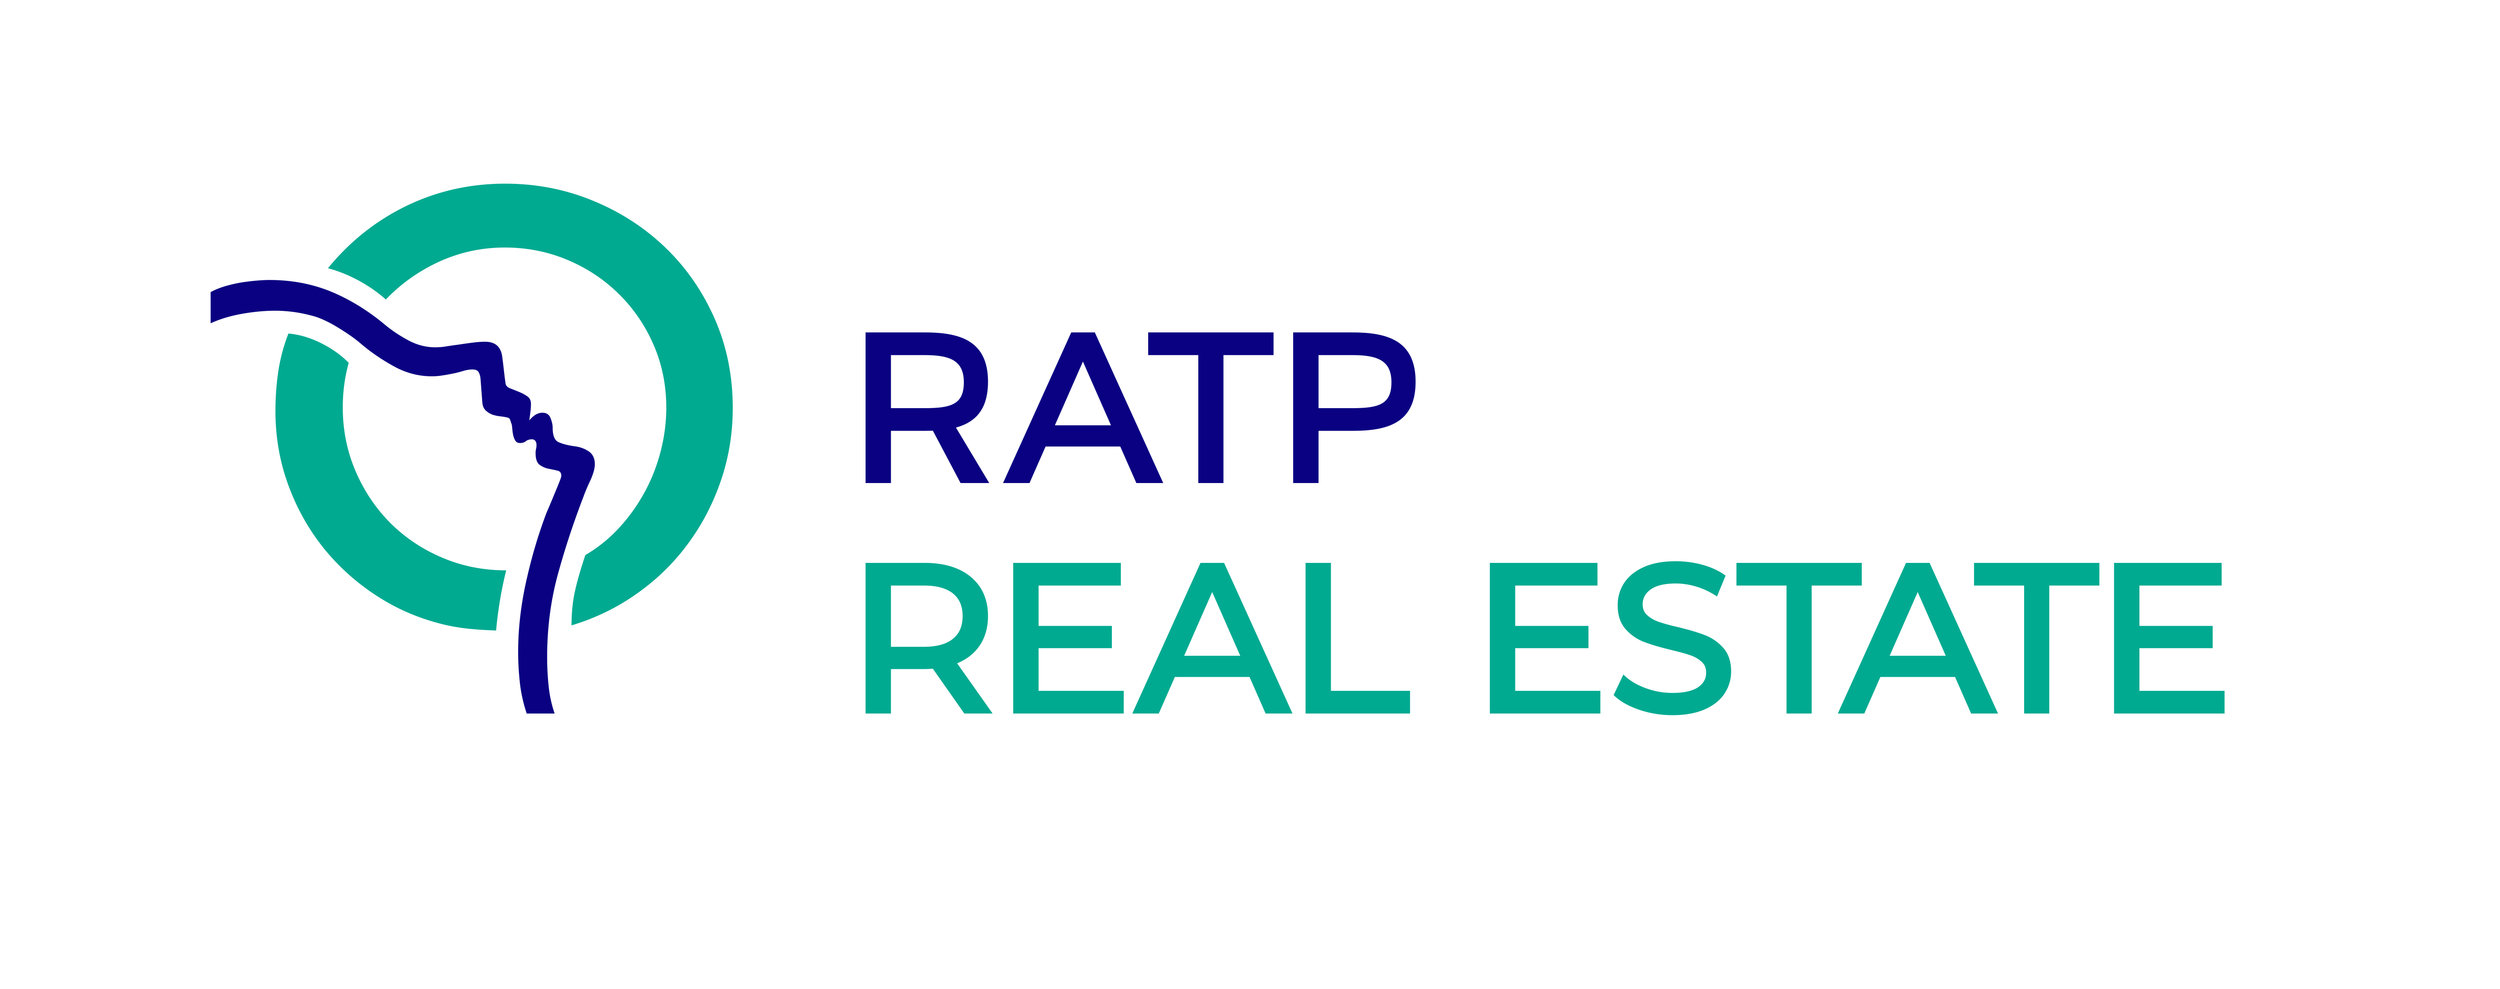 RVB_RATP_REAL_ESTATE_HD.JPG